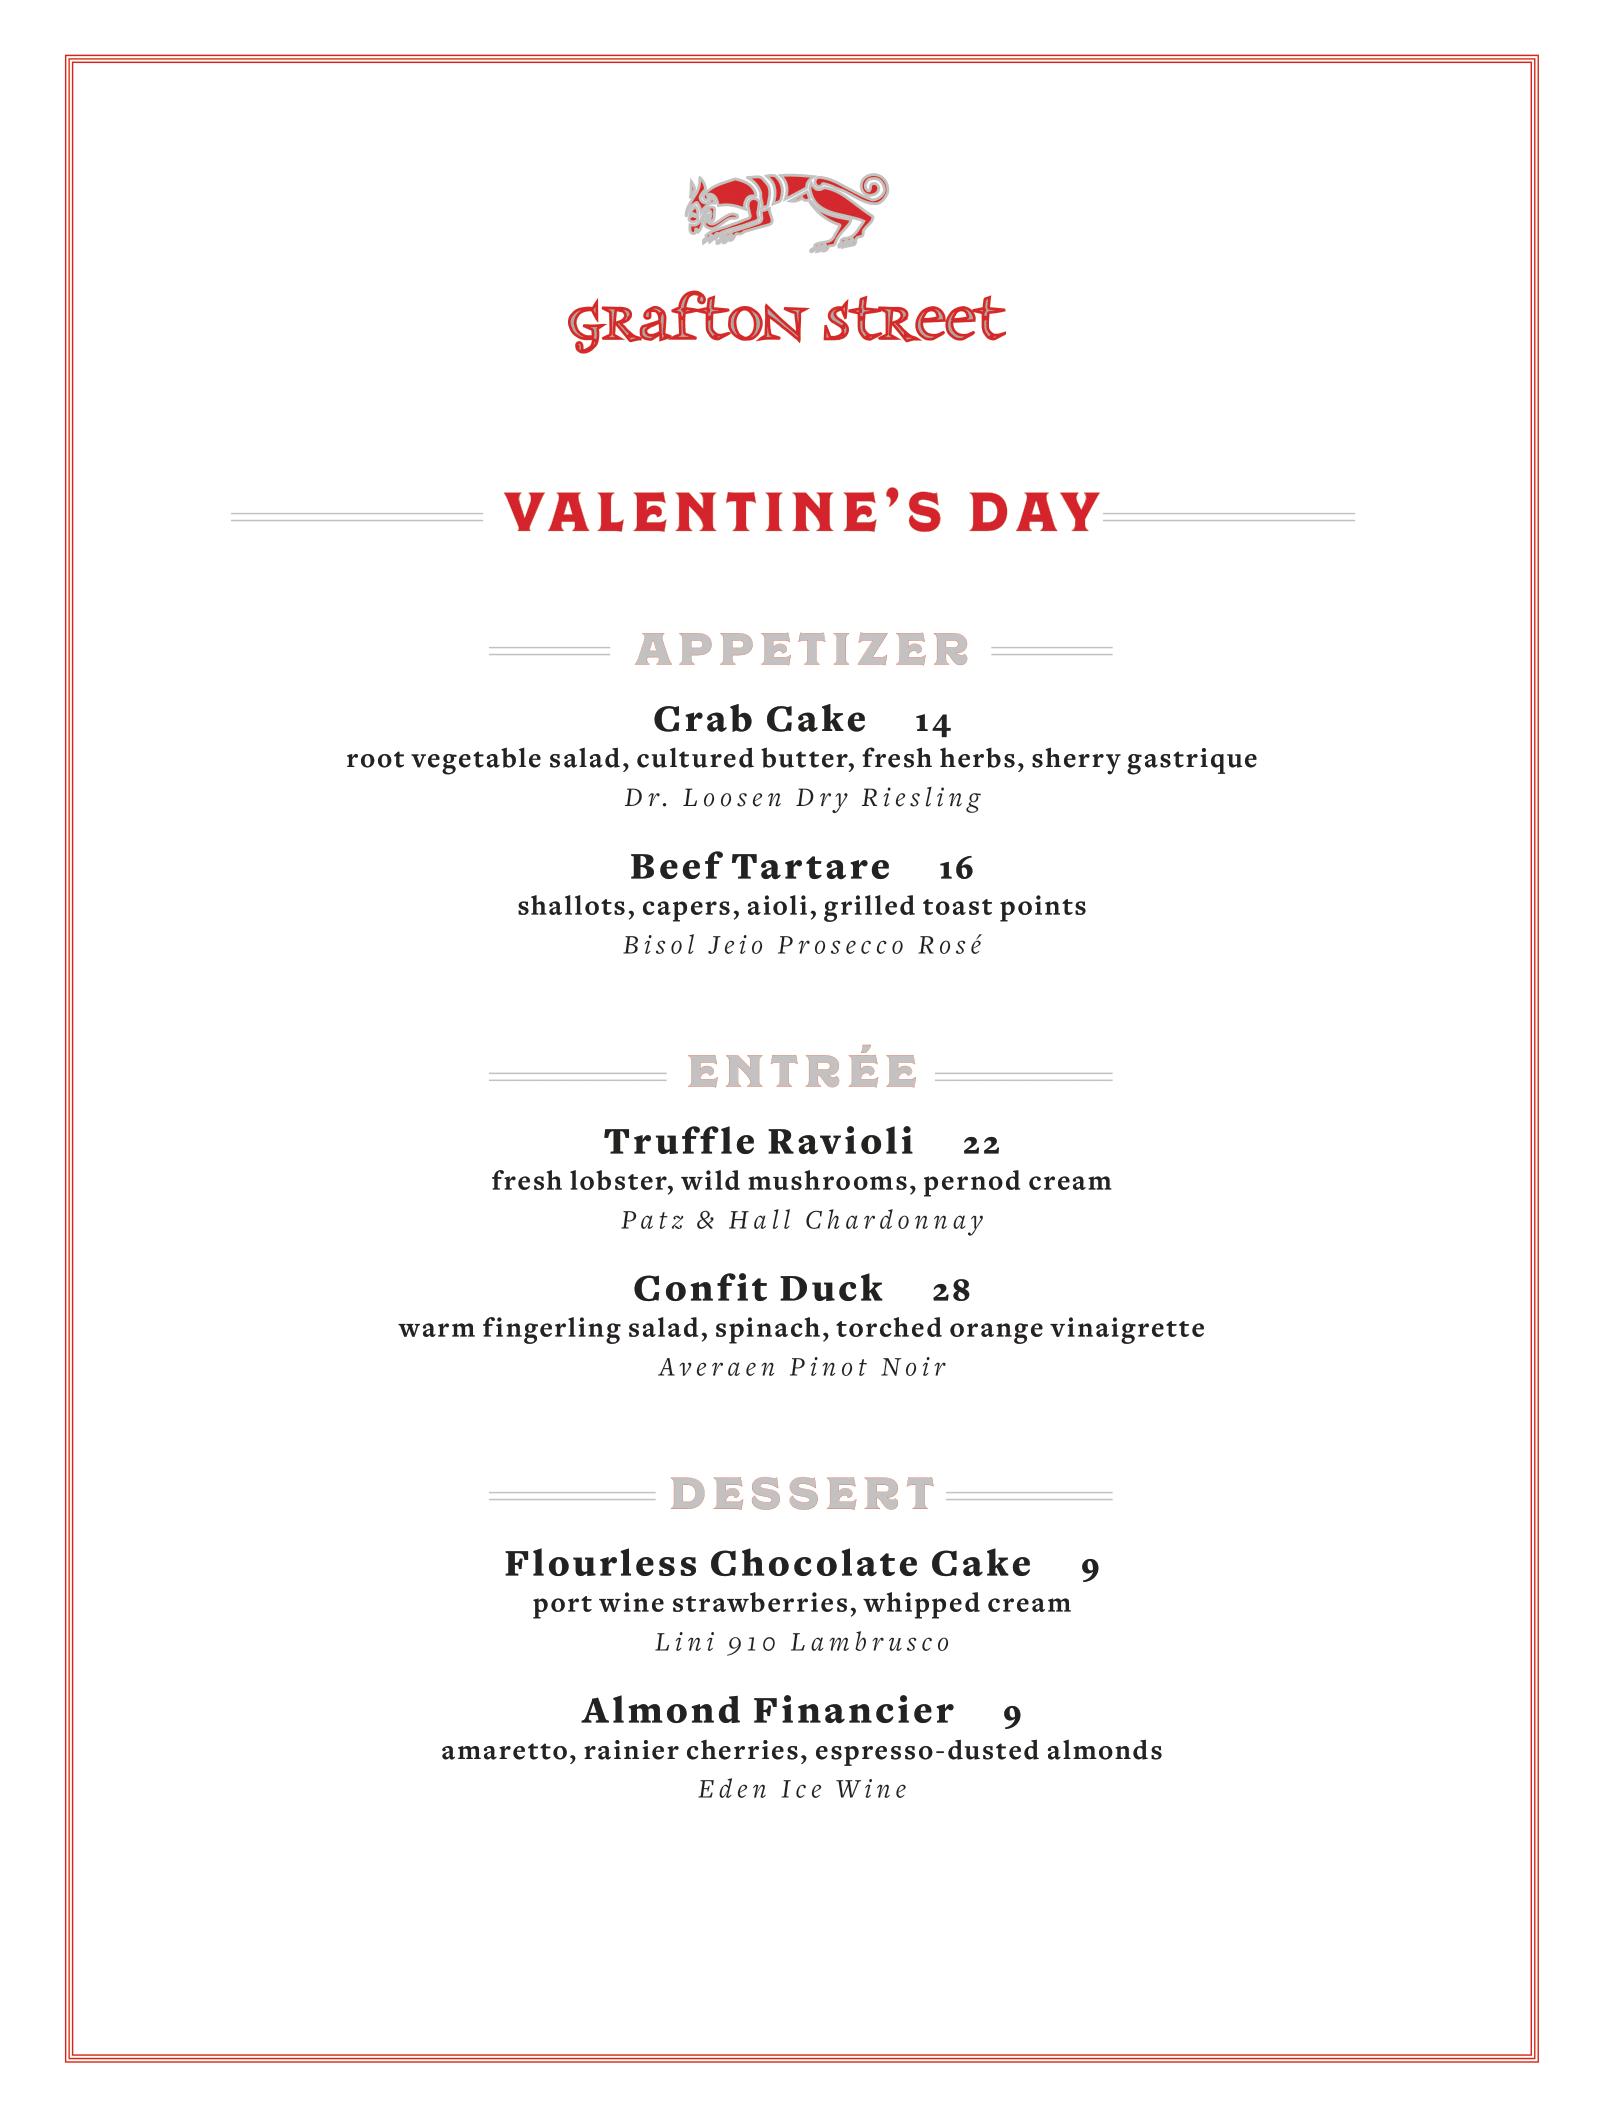 Grafton Street Pub Valentine's